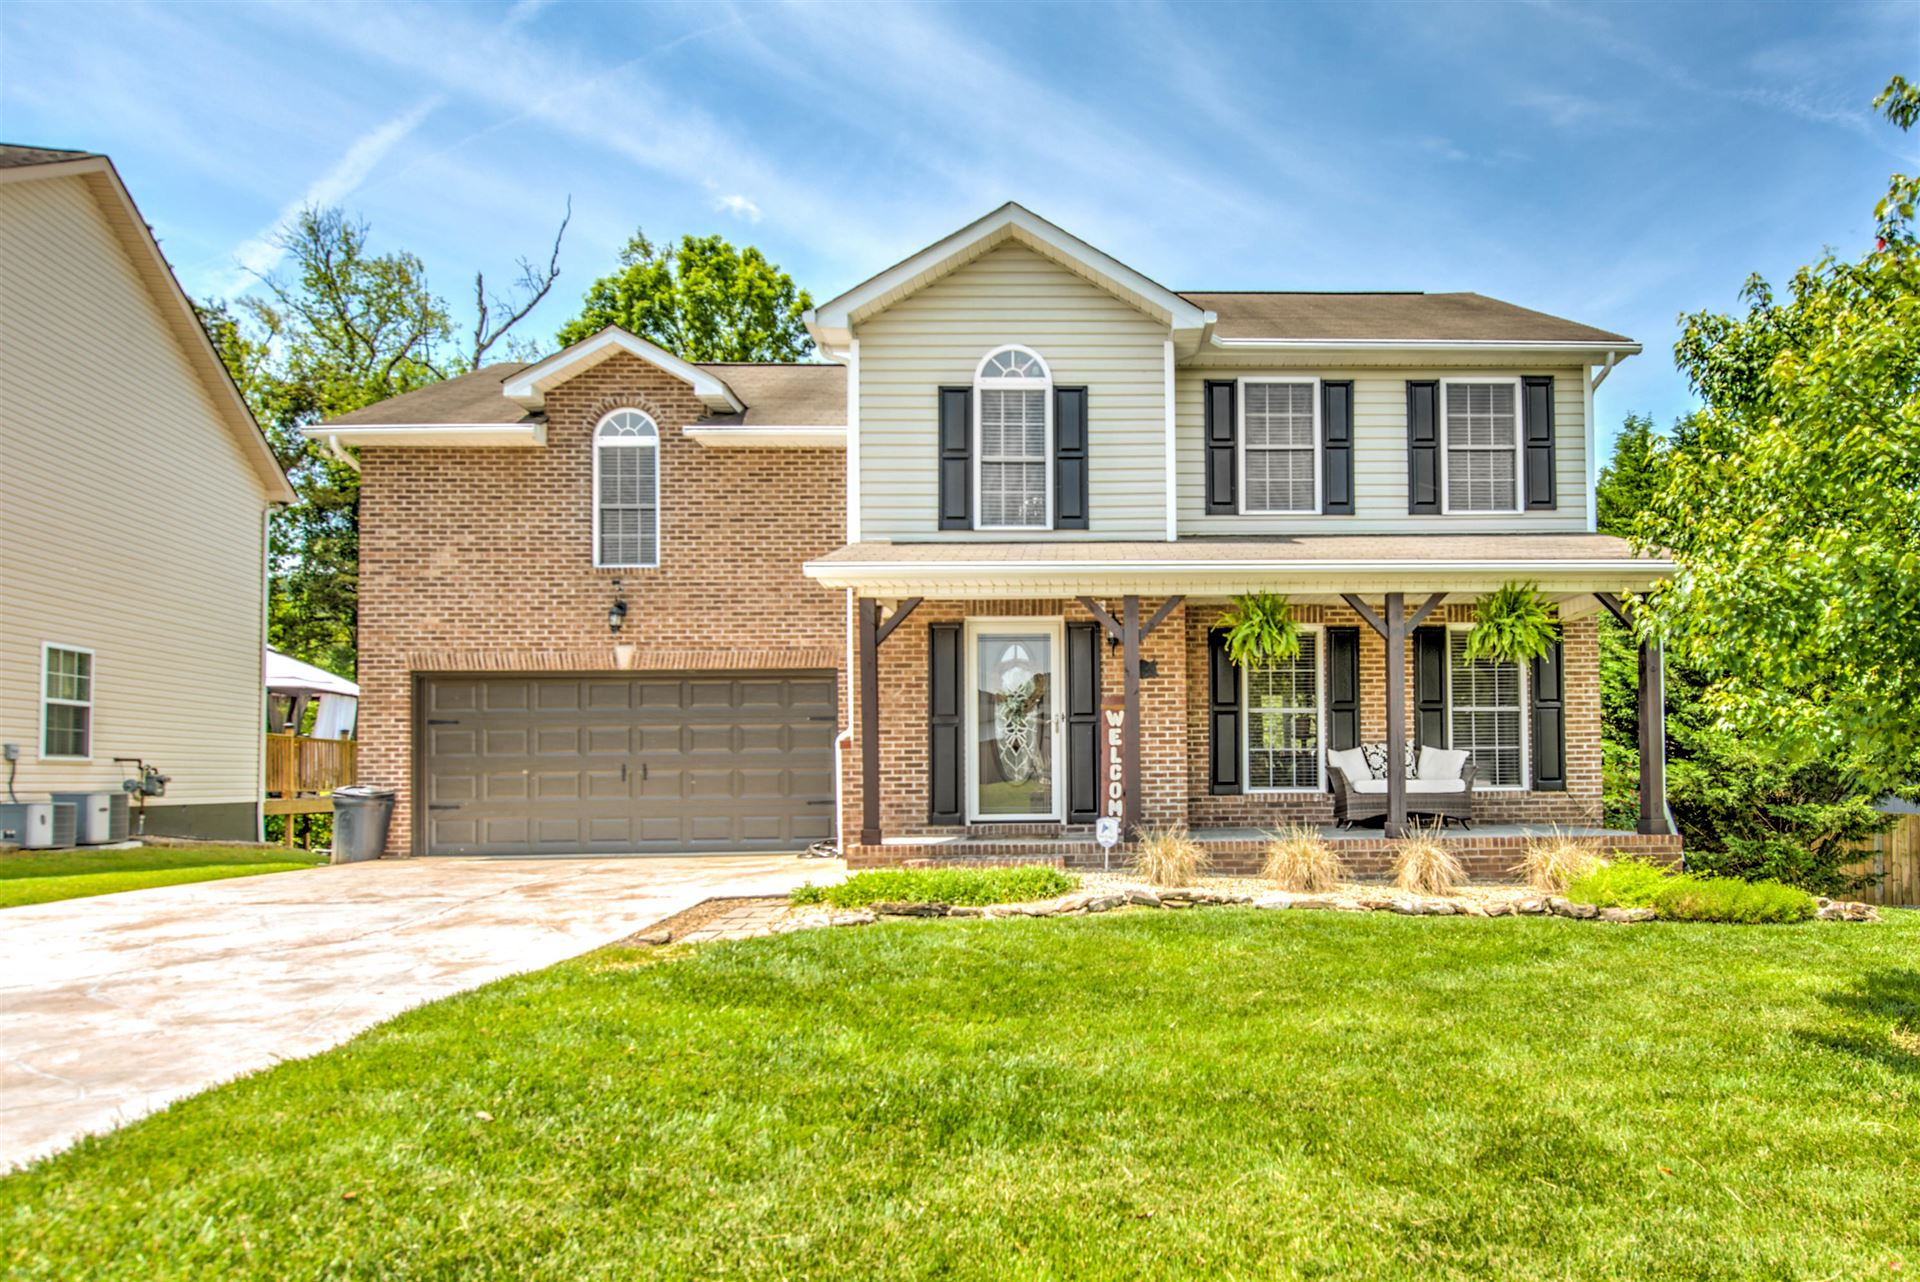 Photo of 6831 Audrianna Lane, Knoxville, TN 37918 (MLS # 1152902)